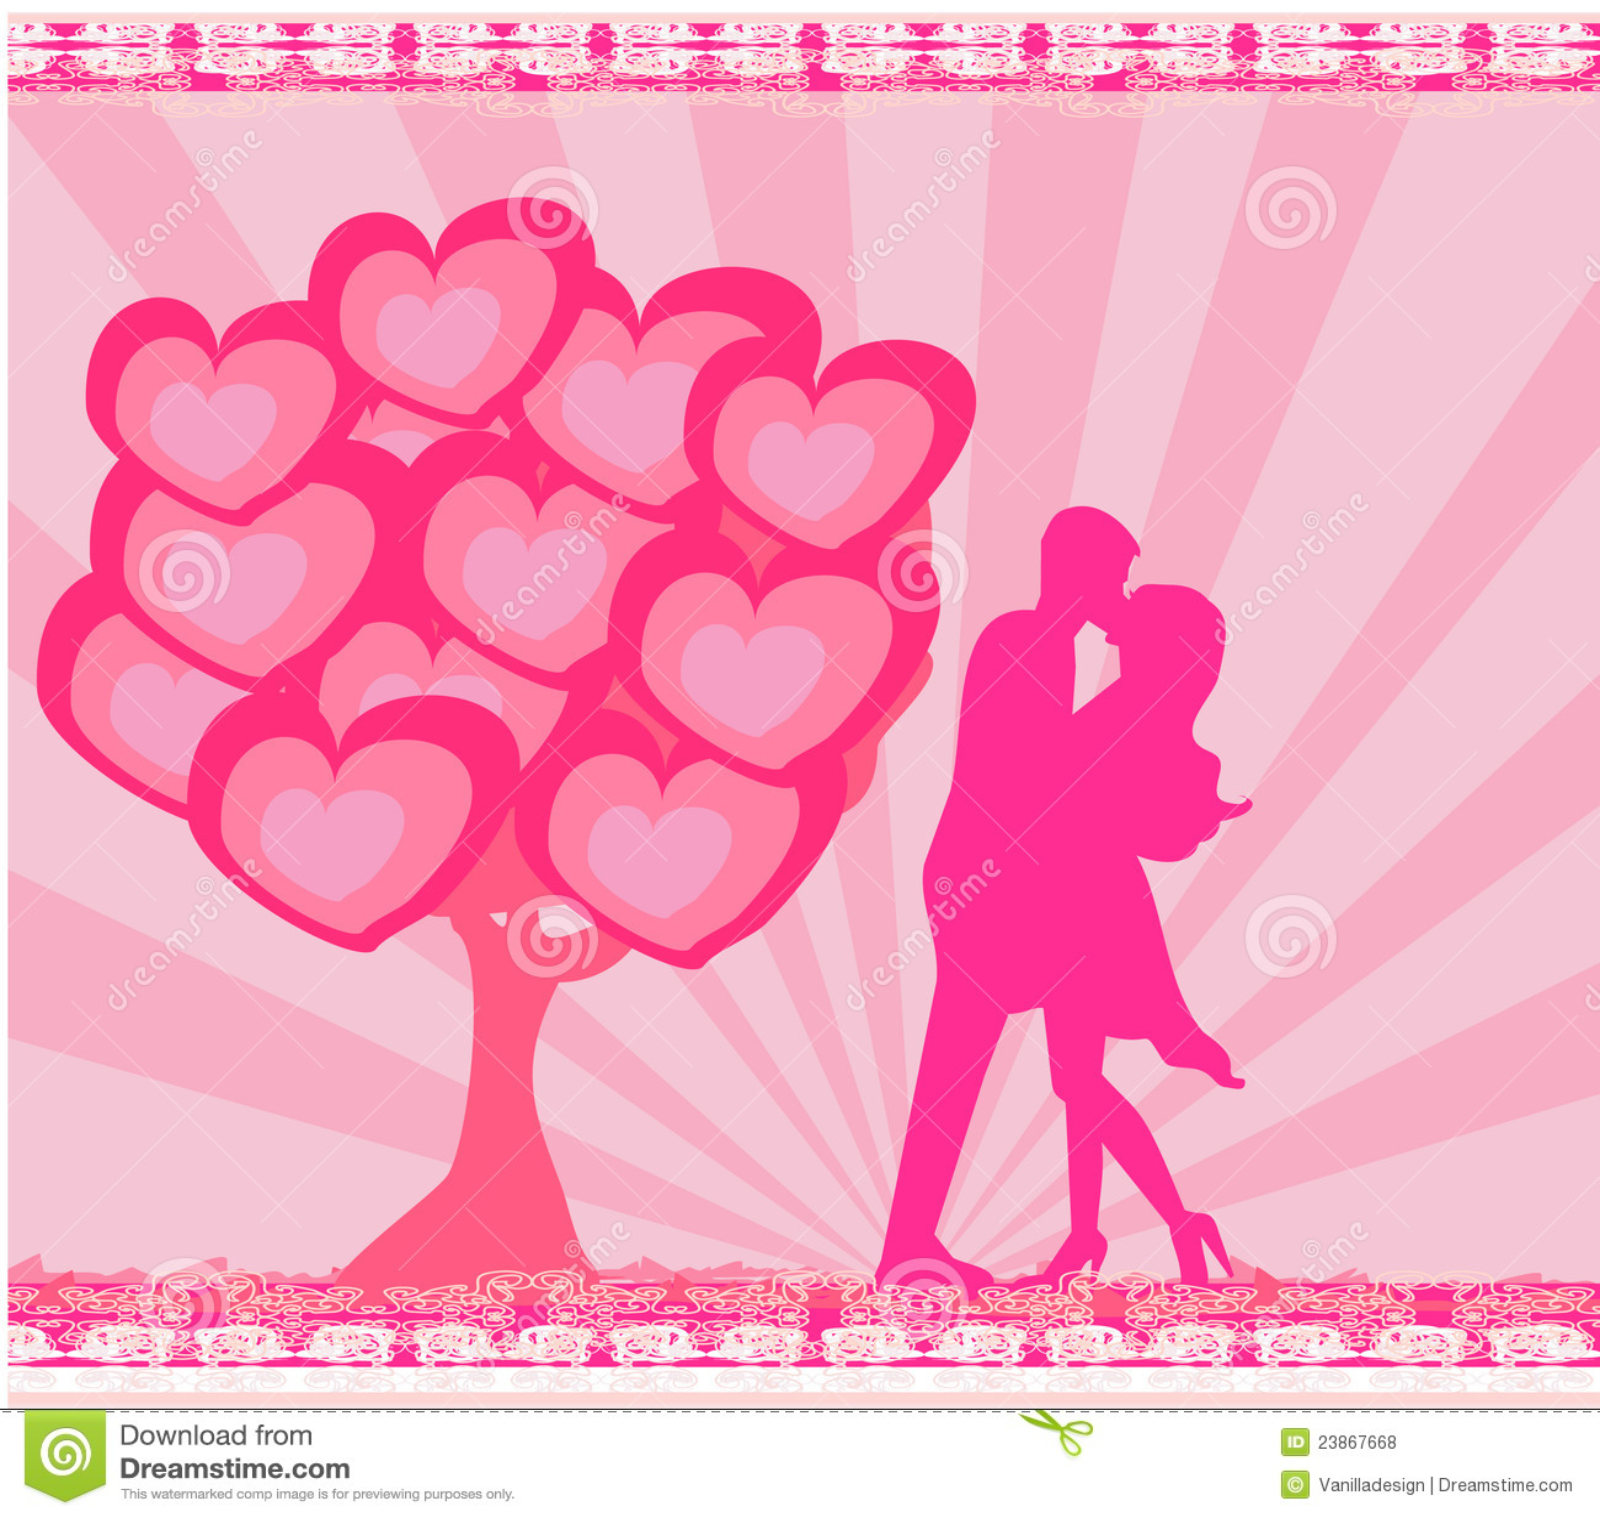 Greeting card romantic couple stock illustration illustration of greeting card romantic couple m4hsunfo